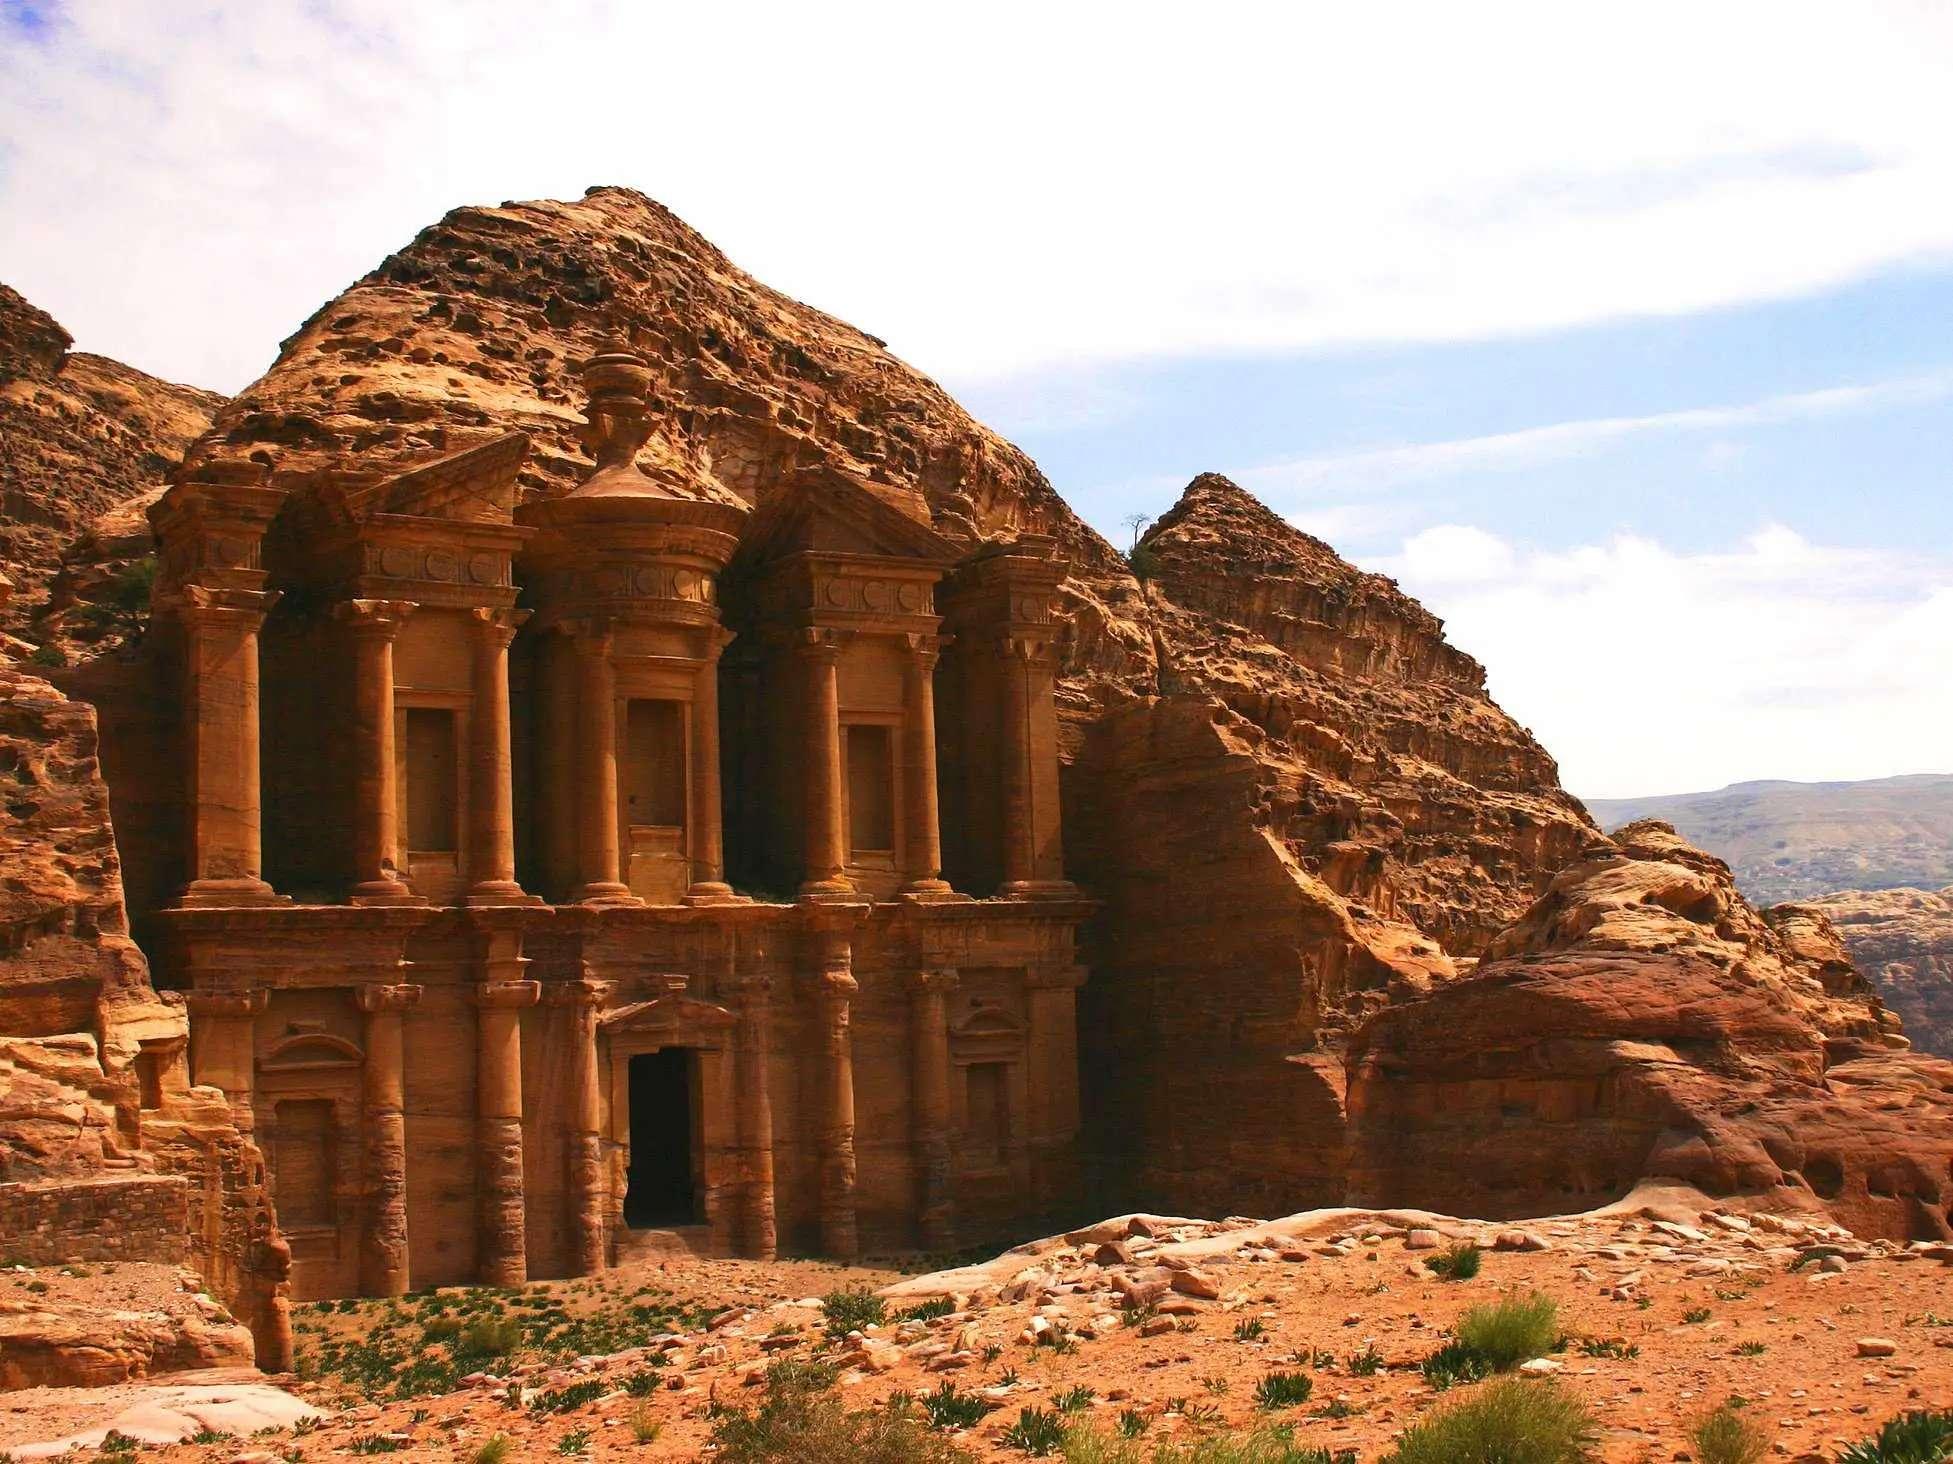 Explore the streets of Petra, an ancient rock city in Jordan.